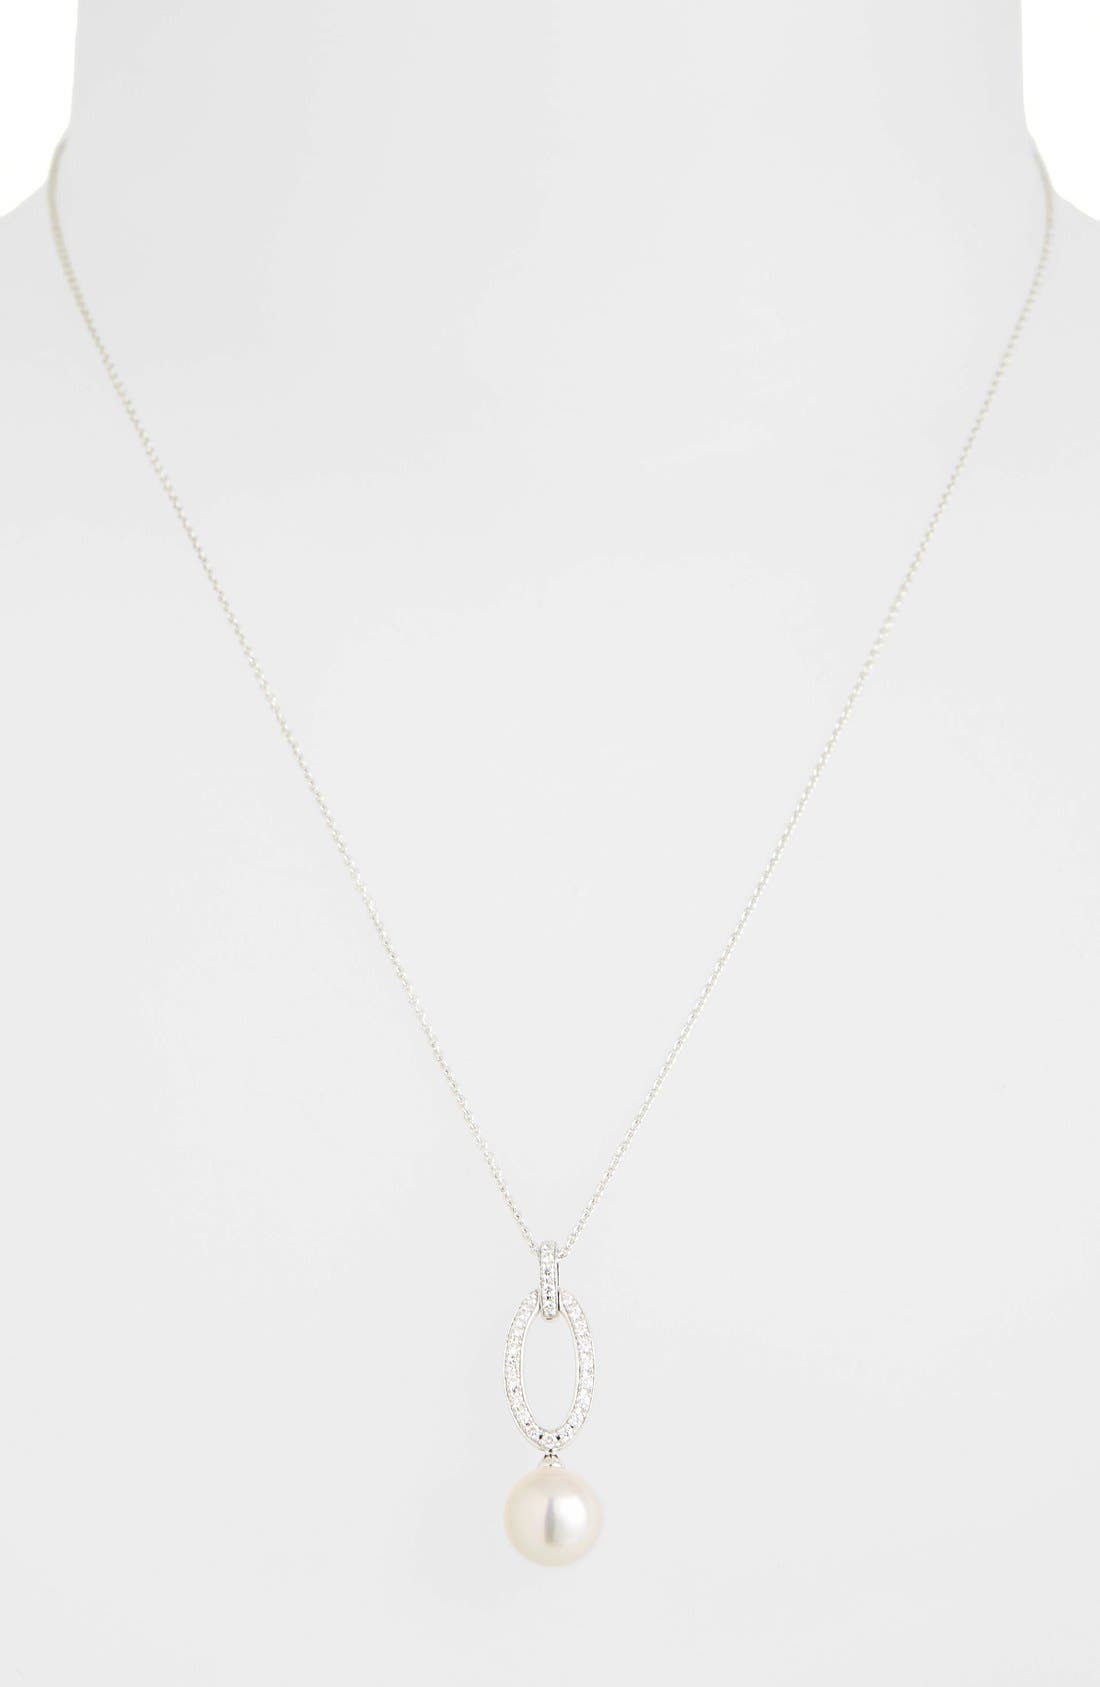 Main Image - Mikimoto Diamond & Akoya Cultured Pearl Pendant Necklace